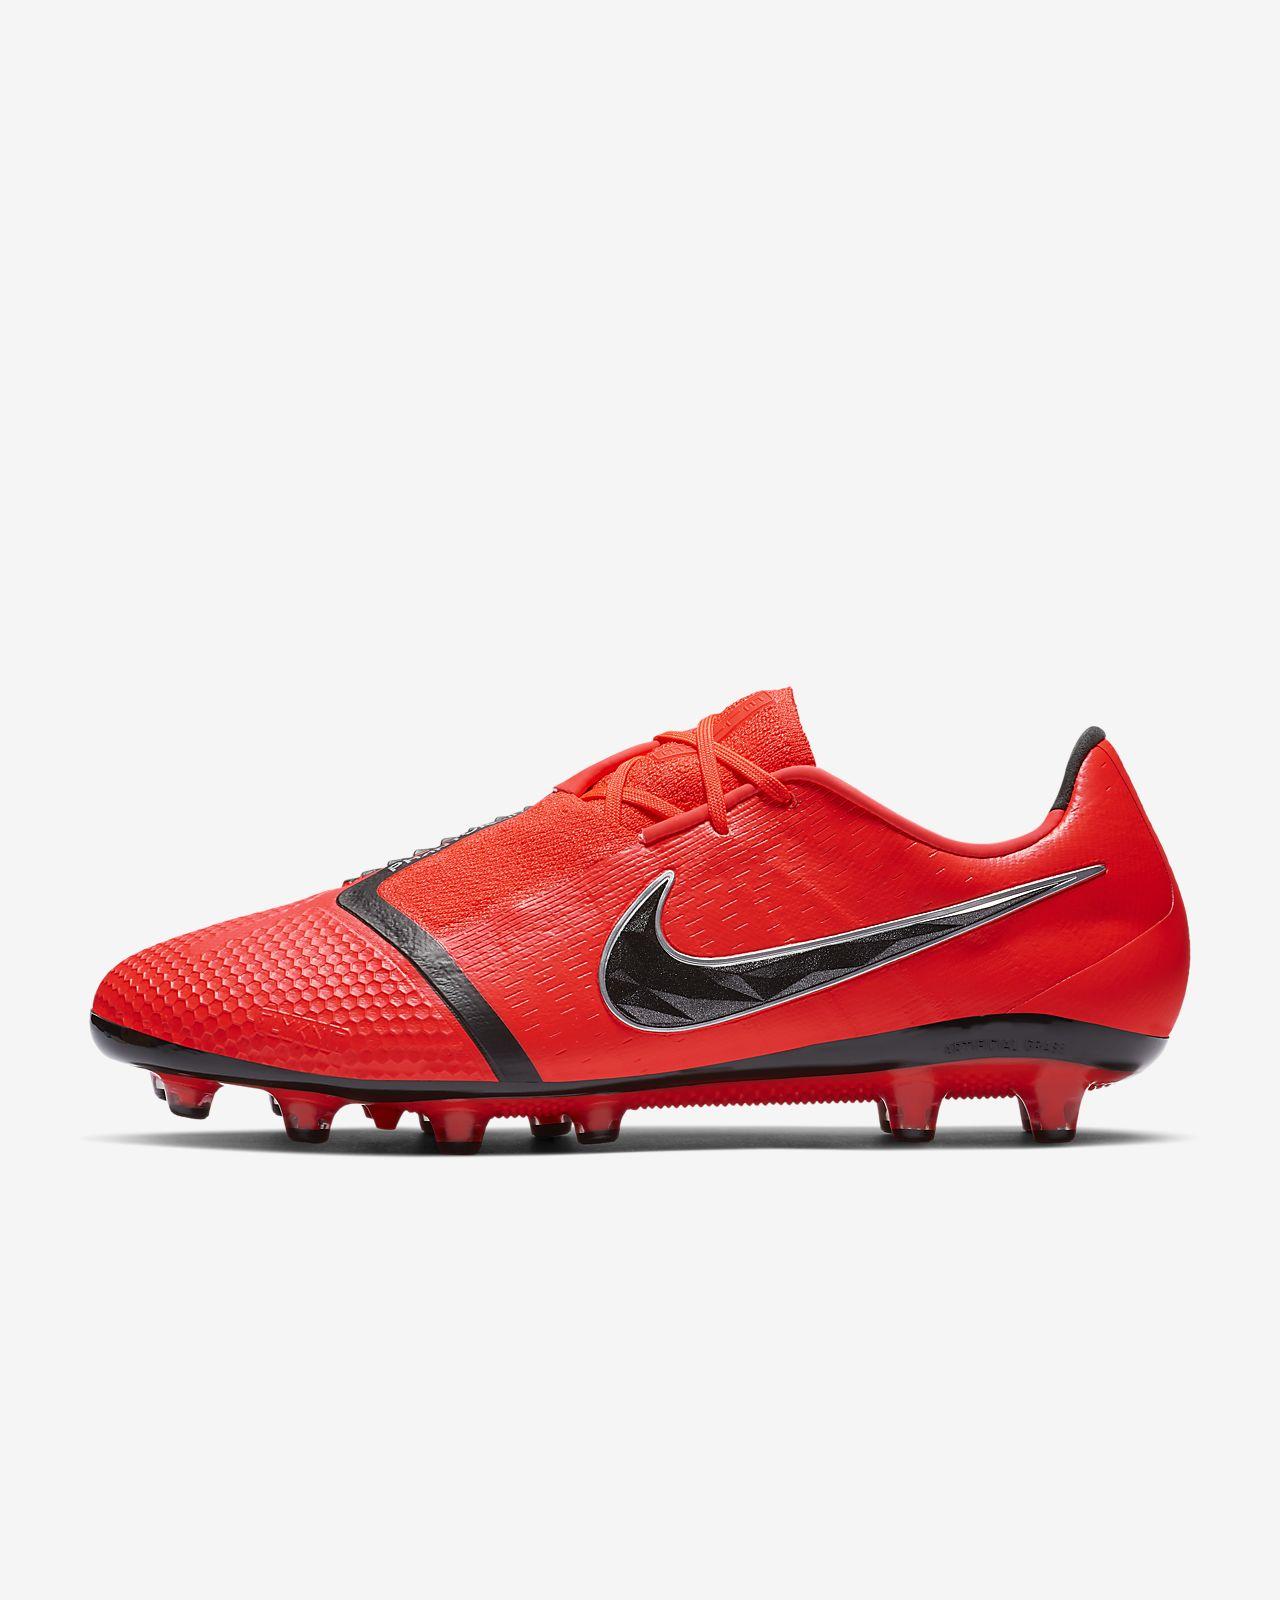 ... Scarpa da calcio per erba artificiale Nike Phantom Venom Elite AG-Pro 1e2e59b8f37